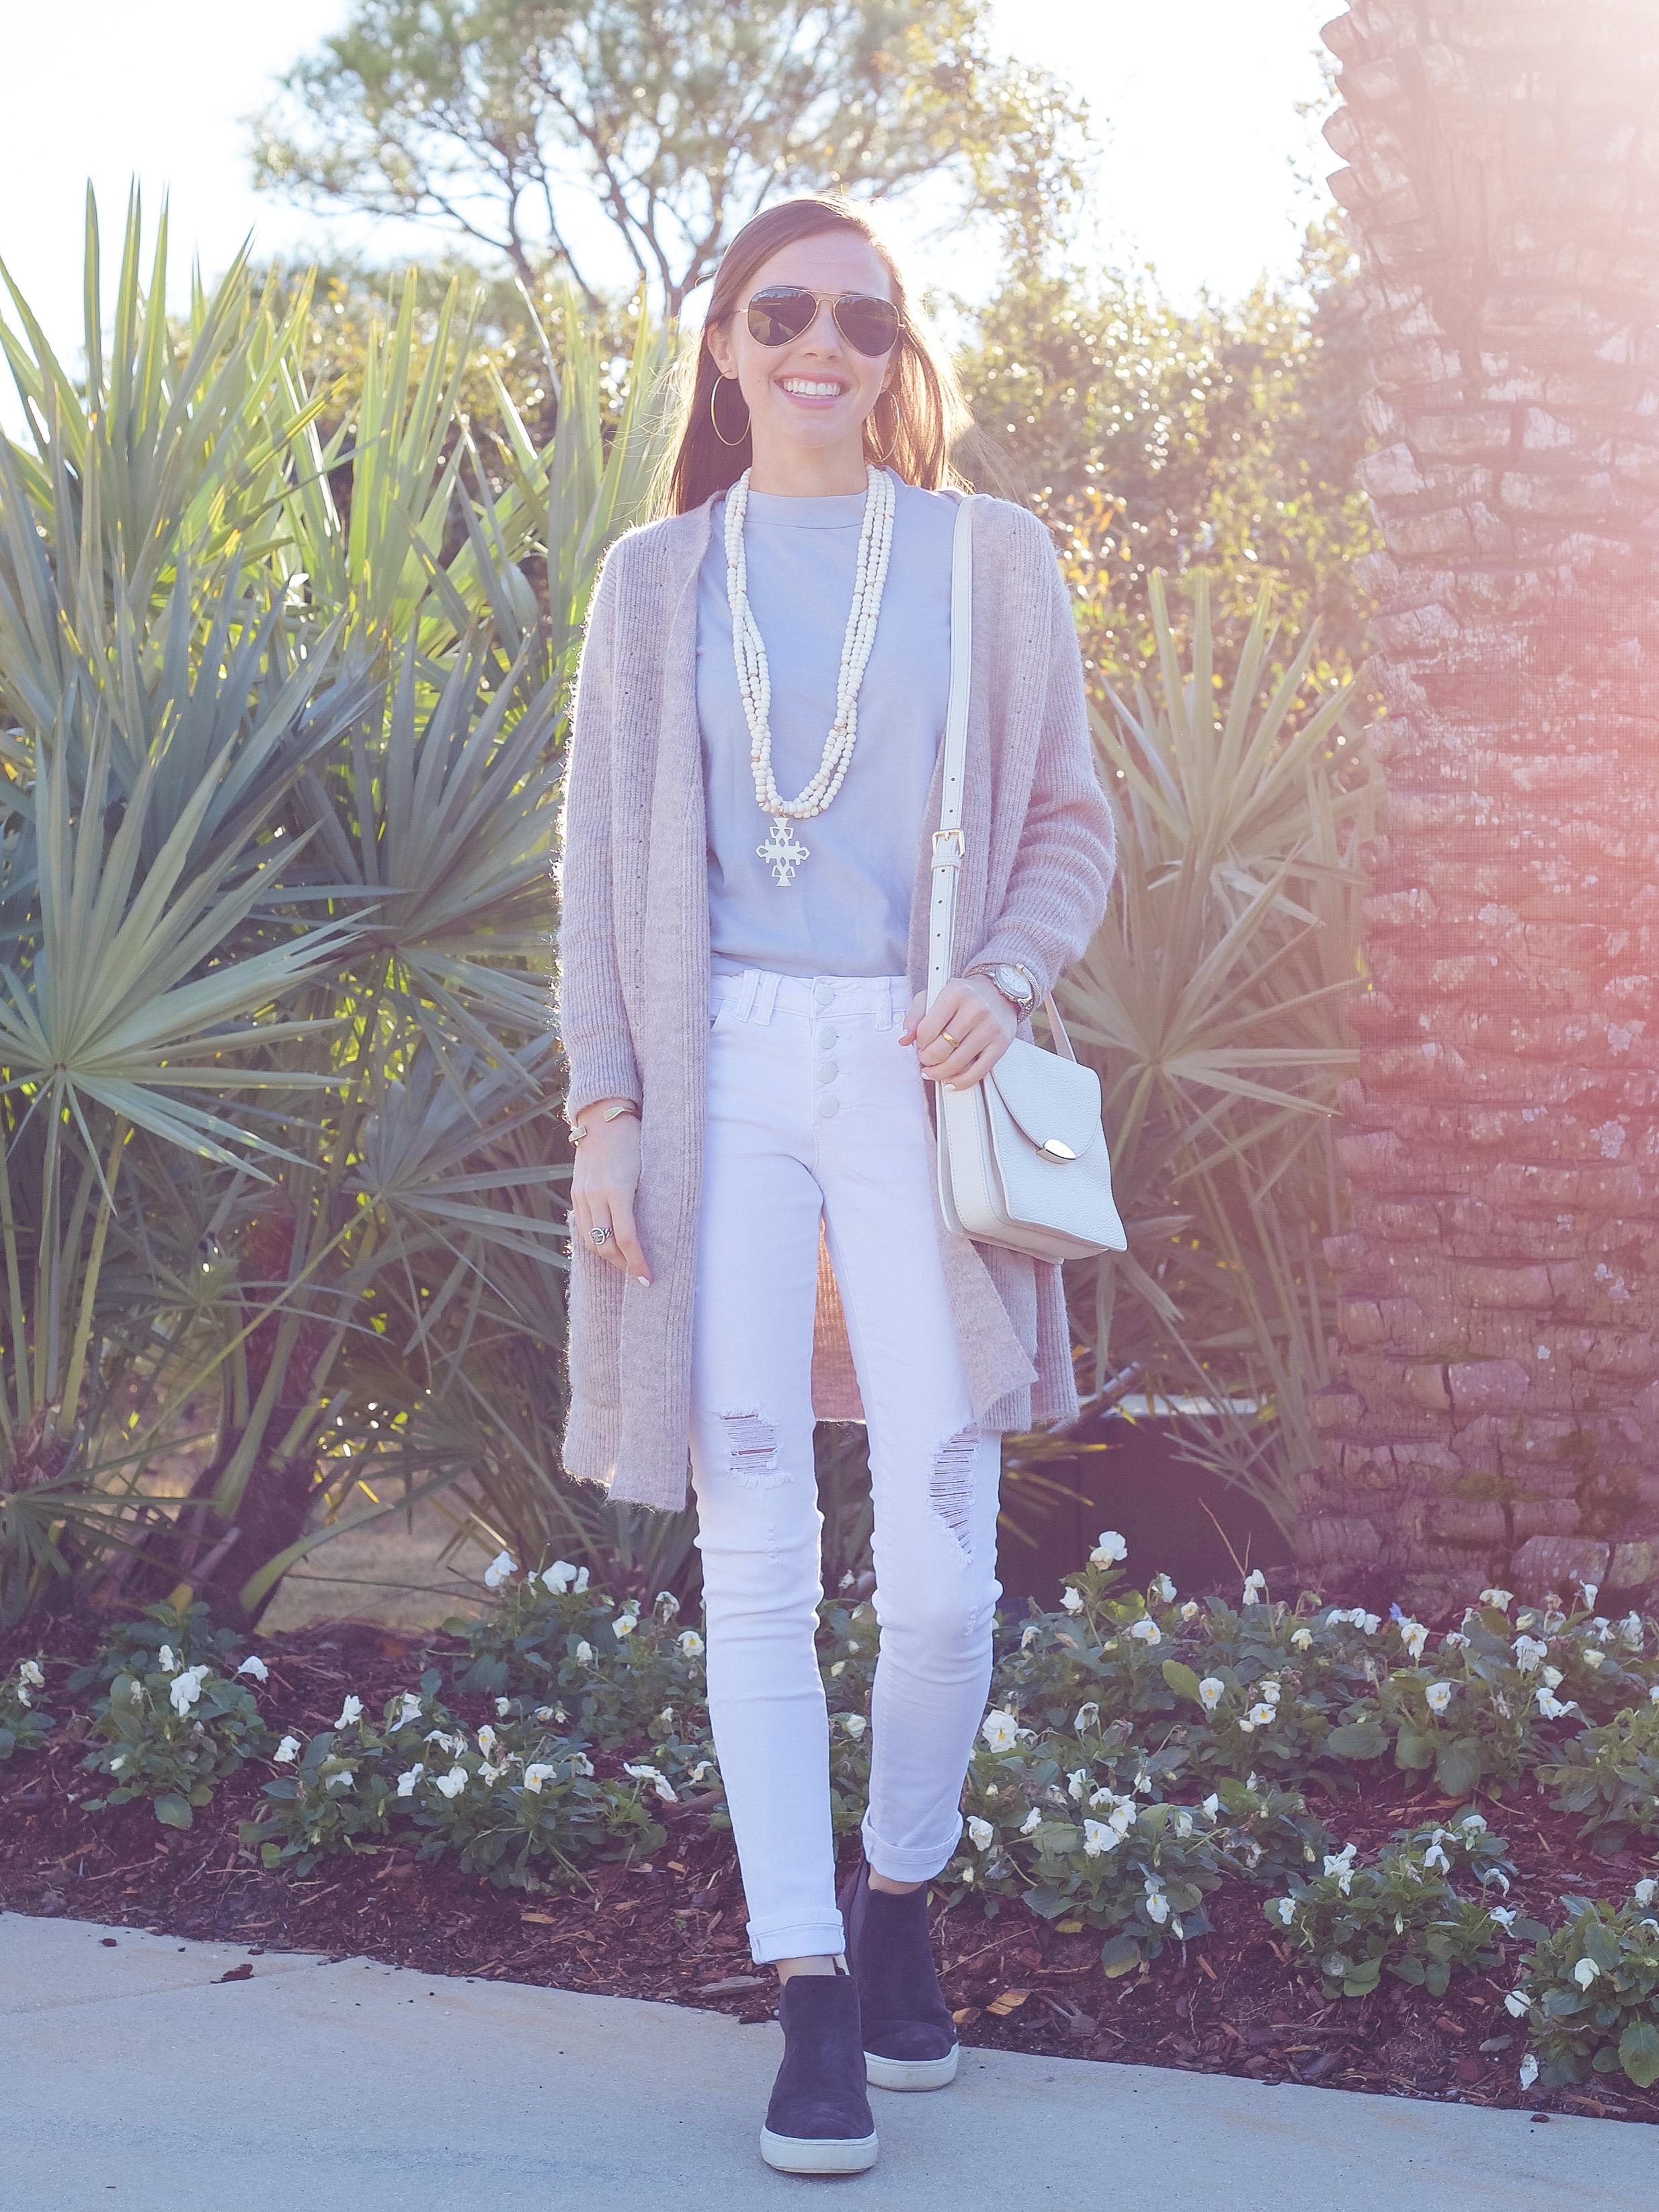 fashion blogger lcb style topshop cardigan-3.jpg